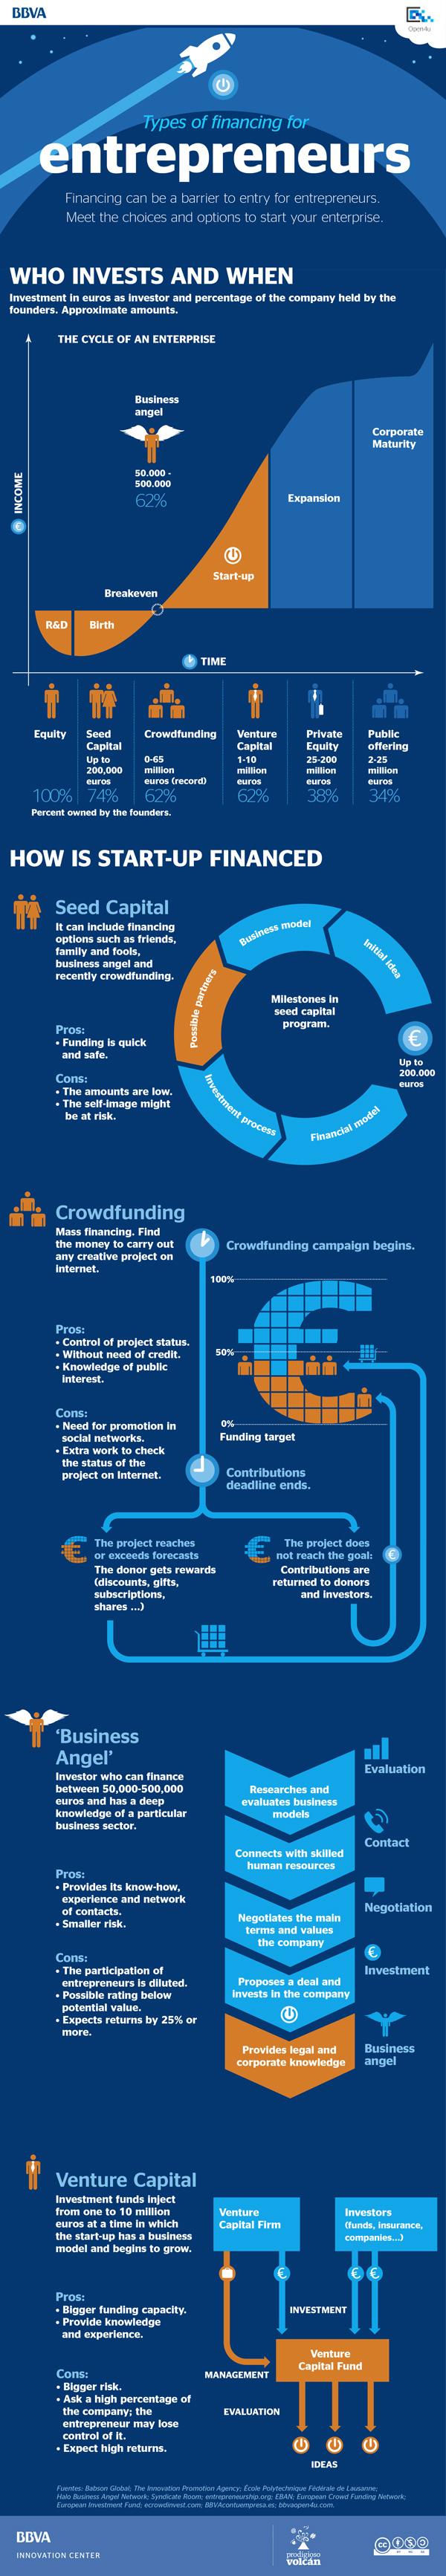 Infographic: Types of financing for entrepreneurs